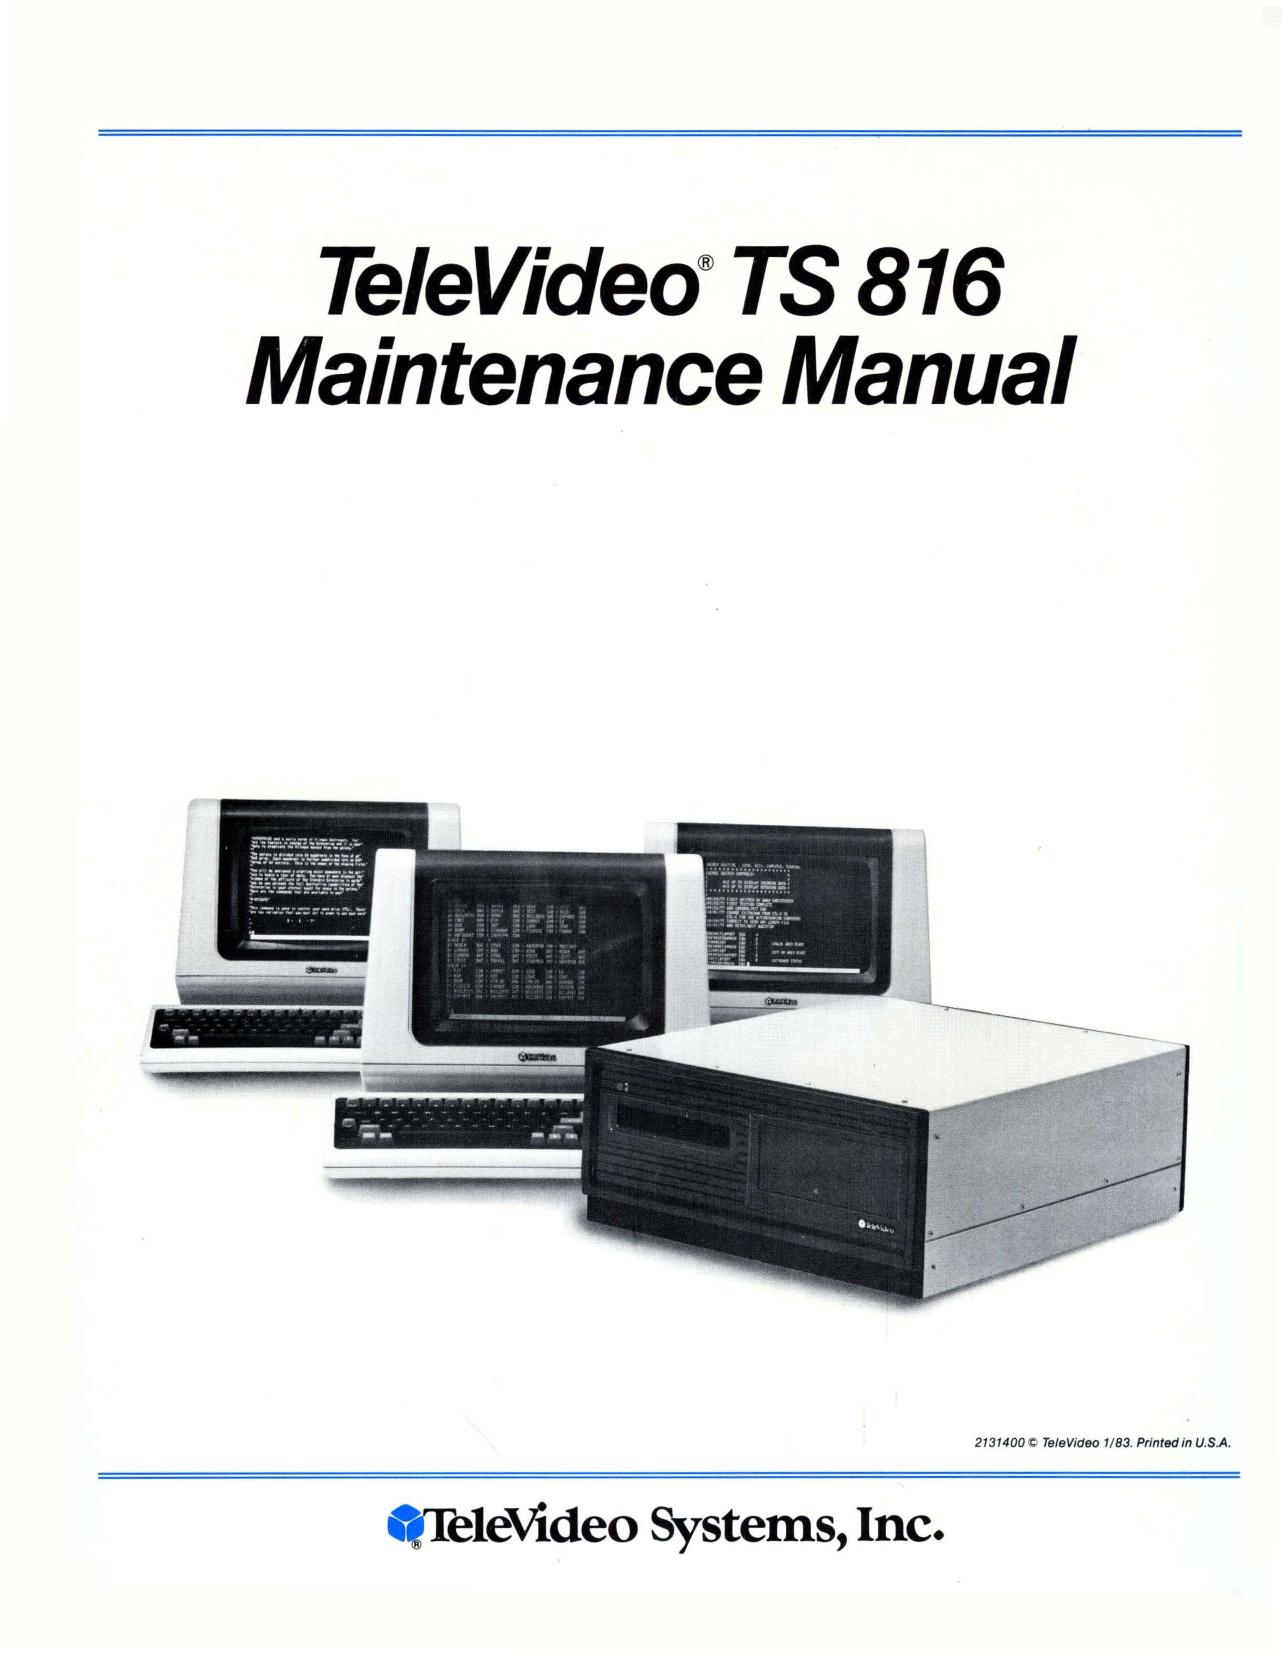 213400_Televideo_TS816_Maintenance_Manual_Jan83.pdf | Manualzz